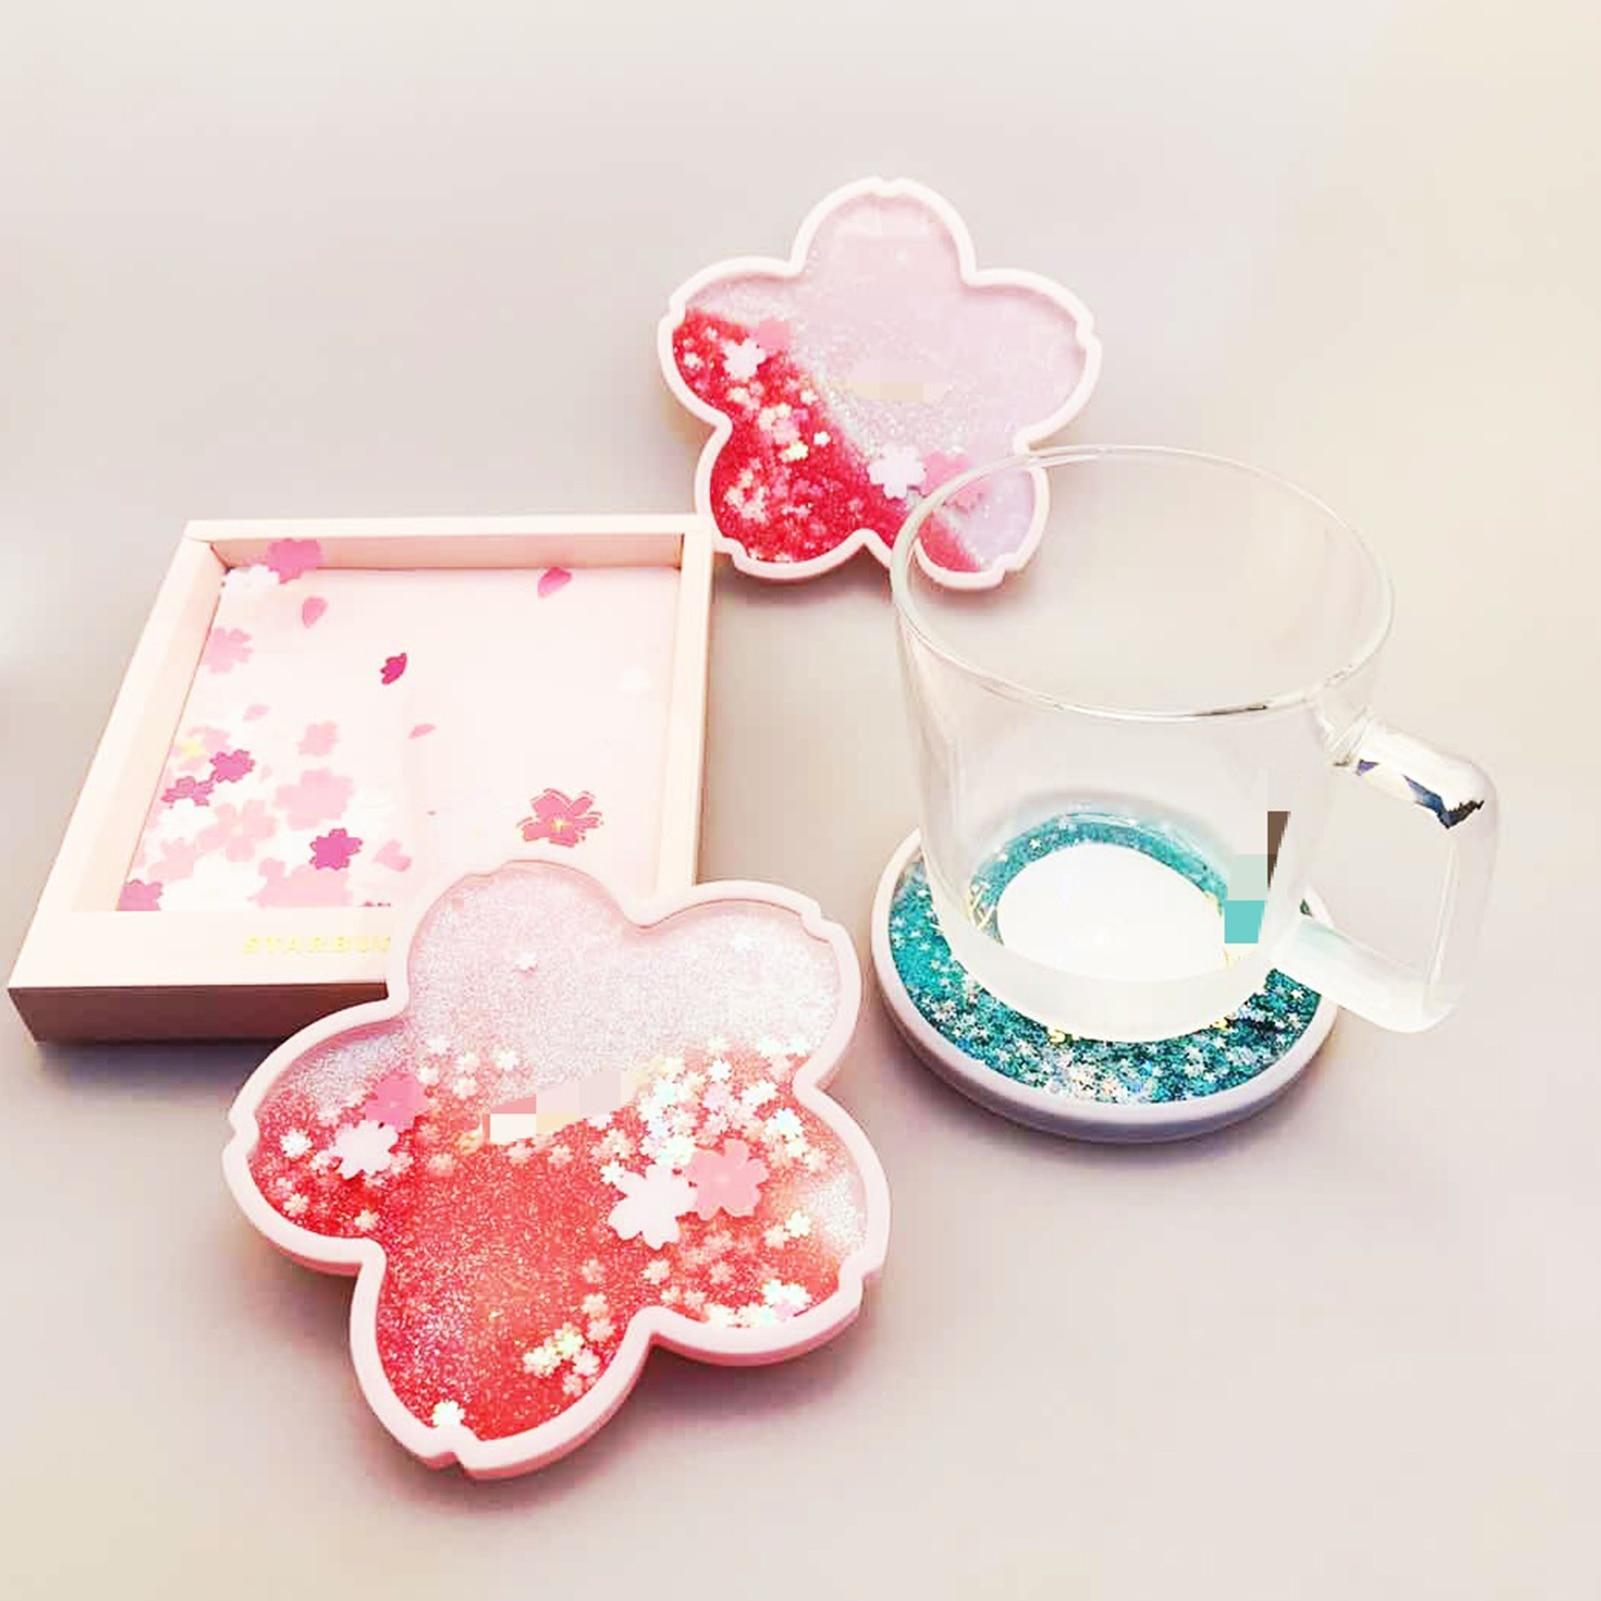 Glittery Sakura Quicksand Drink Mat 6